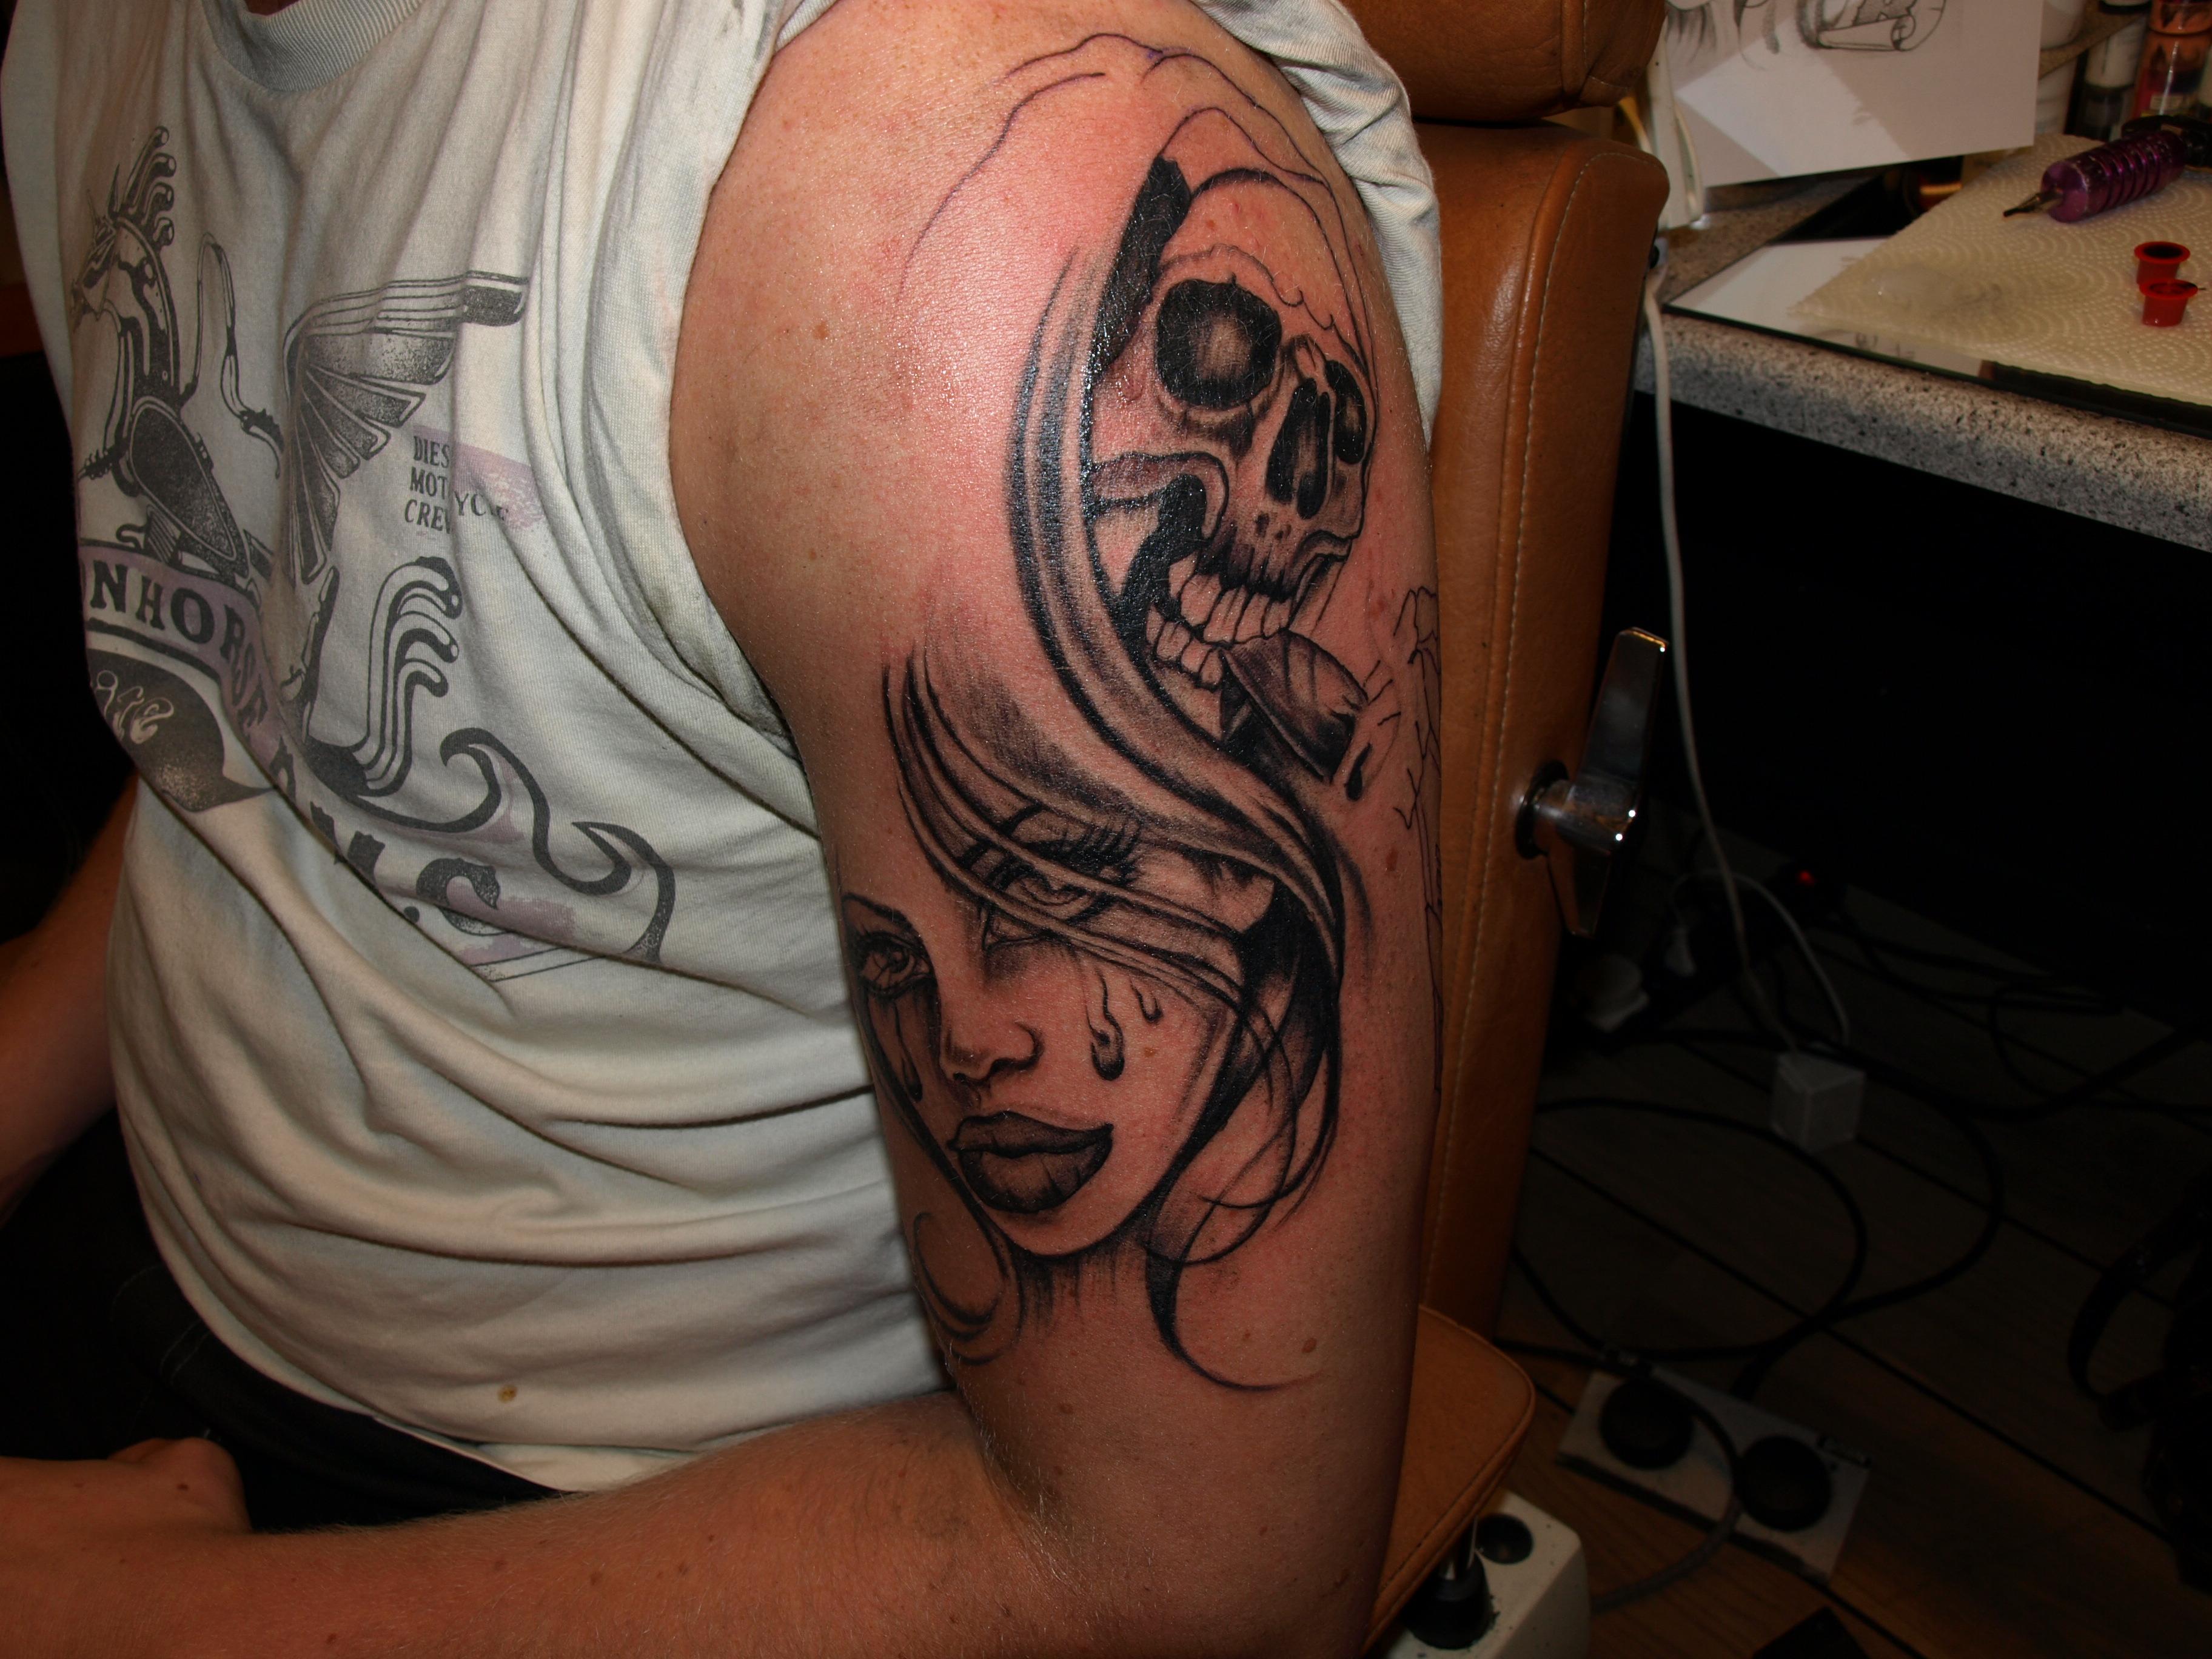 Fari brady tattoo body piercing shading tattoo for How to shade tattoos